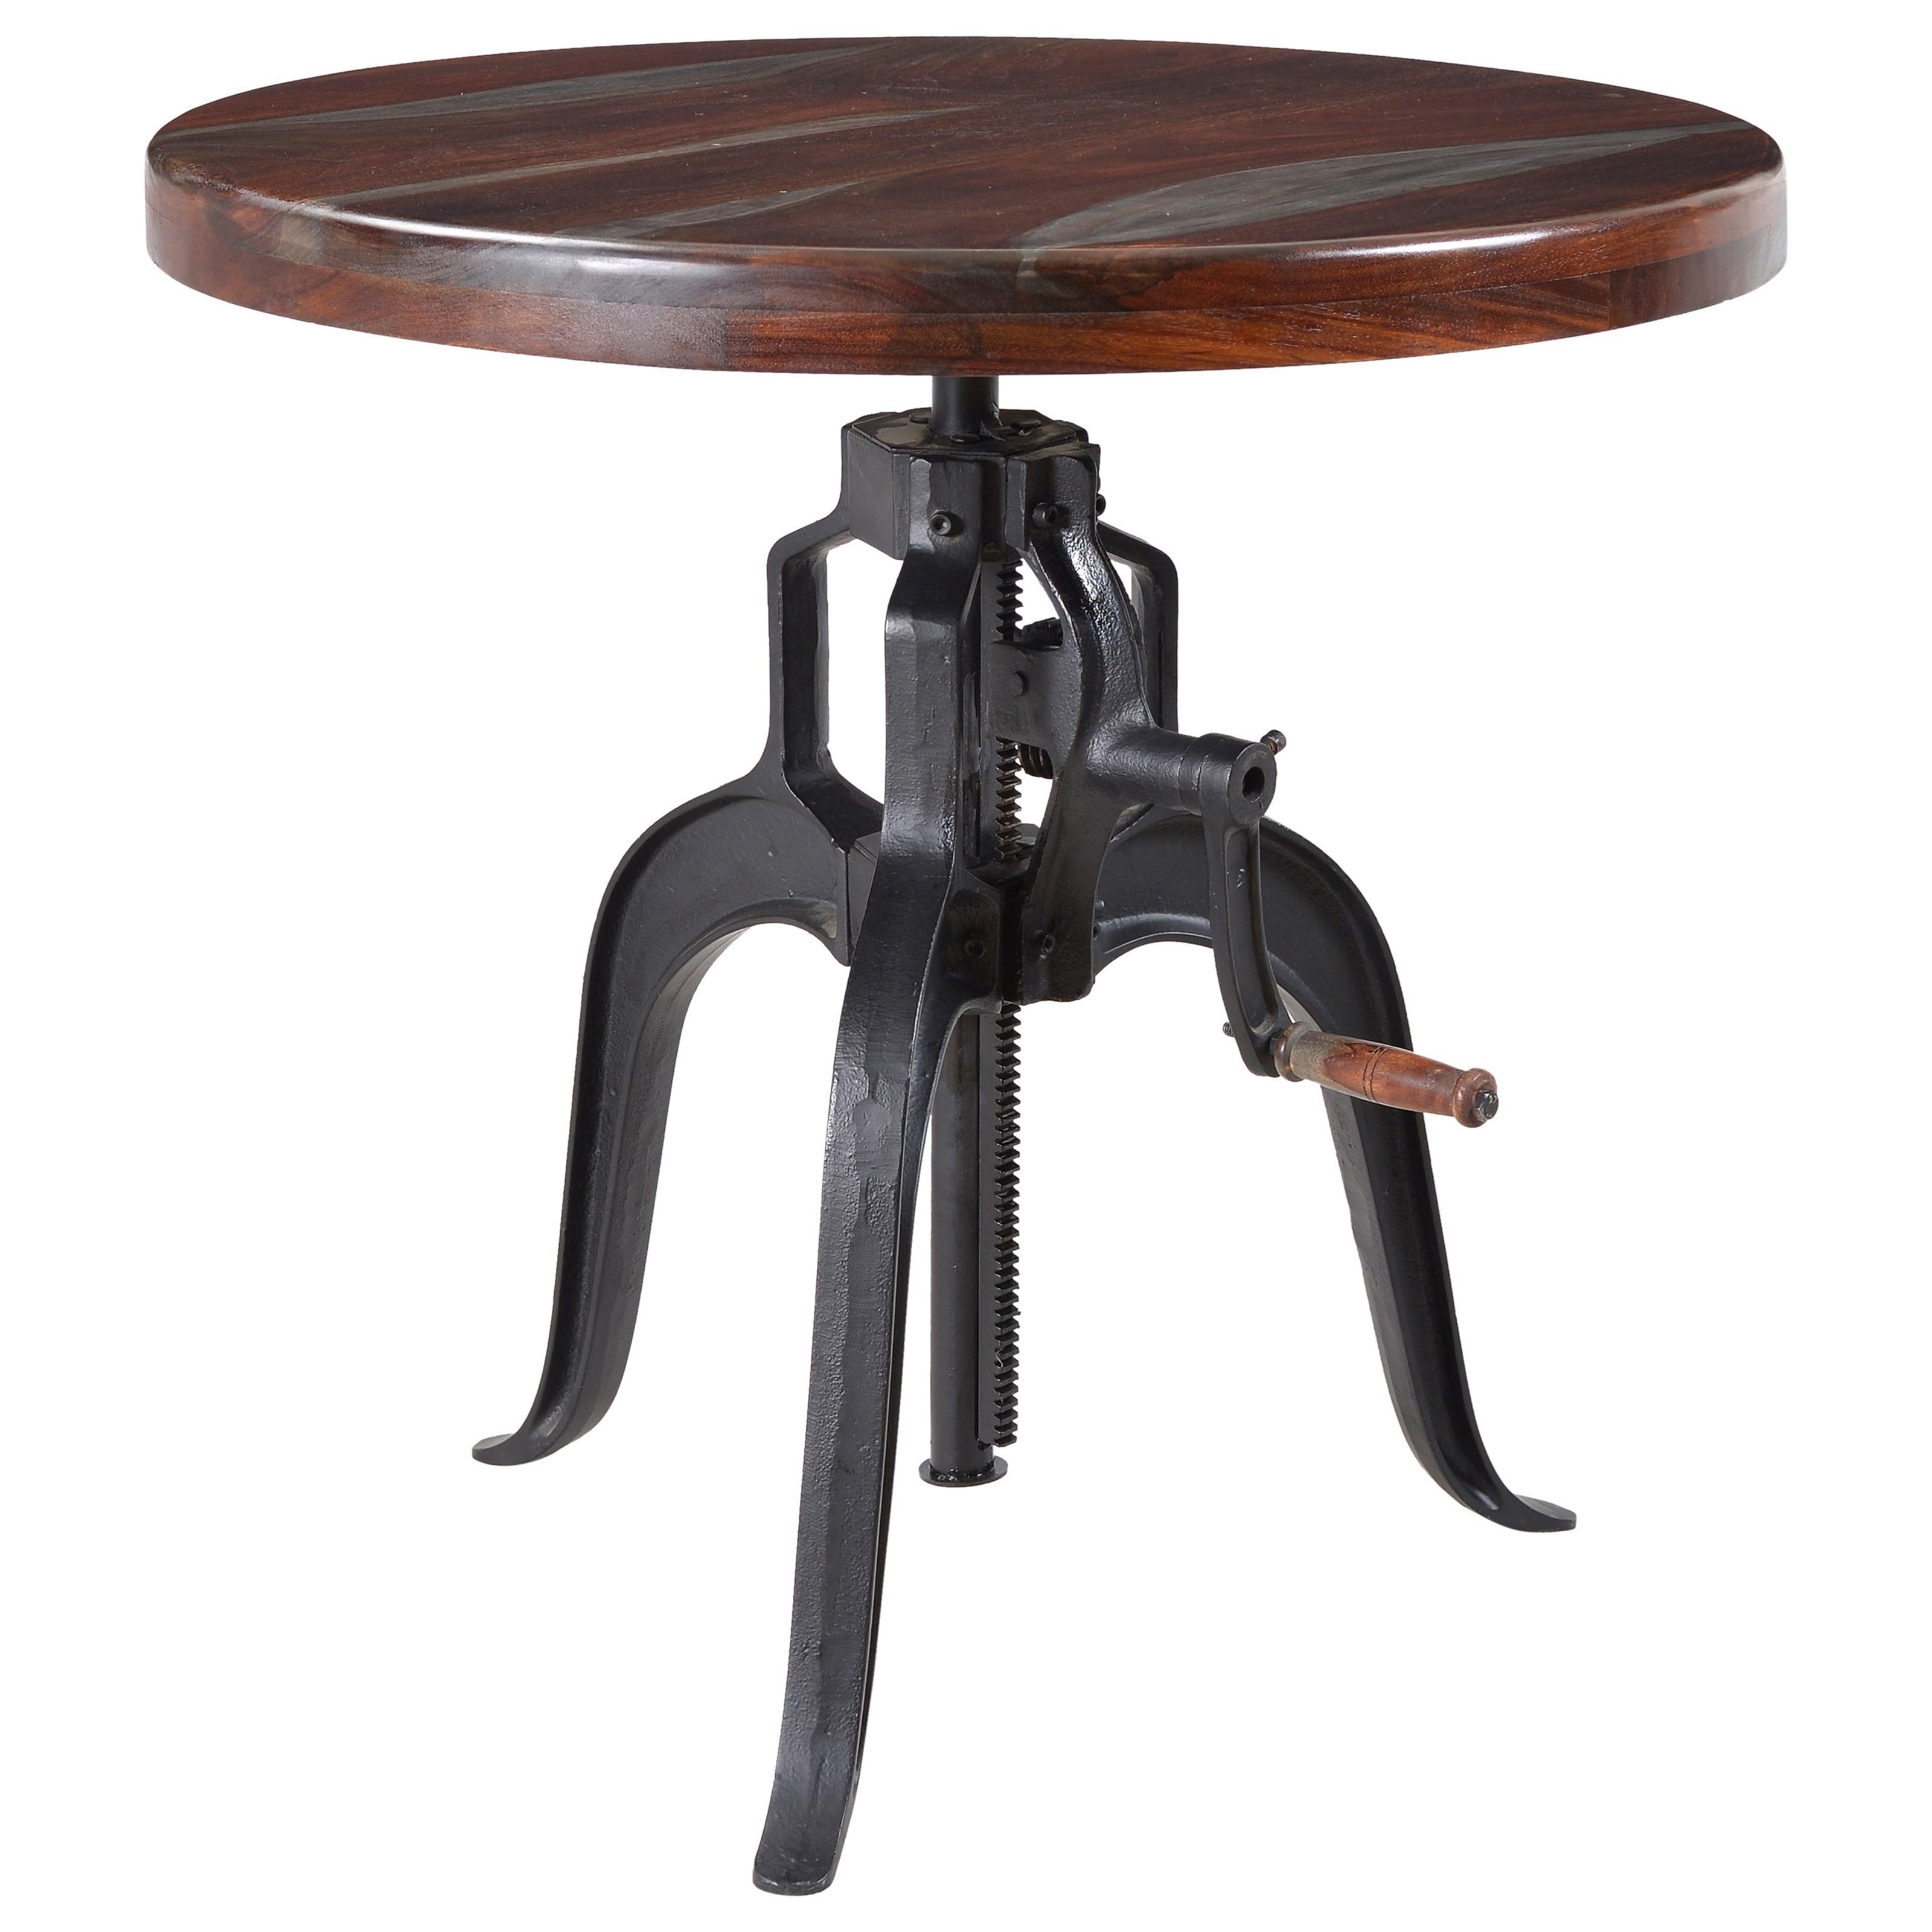 Liverpool Adjustable Bistro/Pub Table by C2C at Walker's Furniture